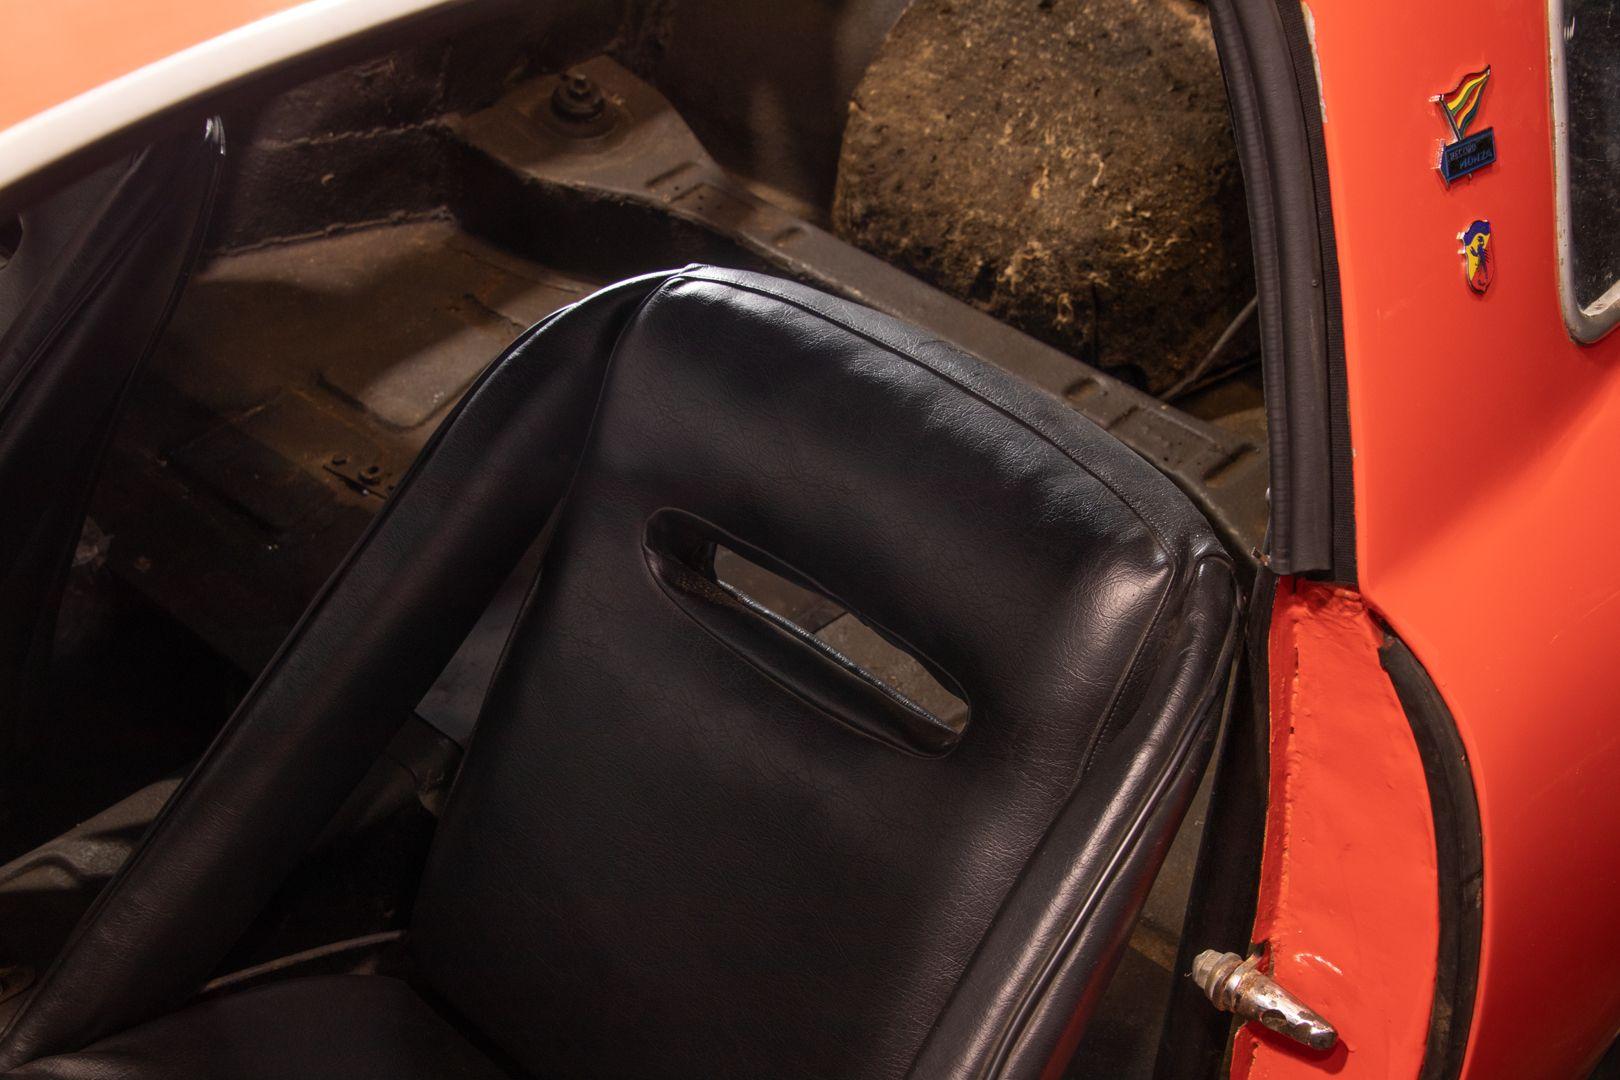 1960 Fiat Abarth 750 Bialbero record Monza 33333